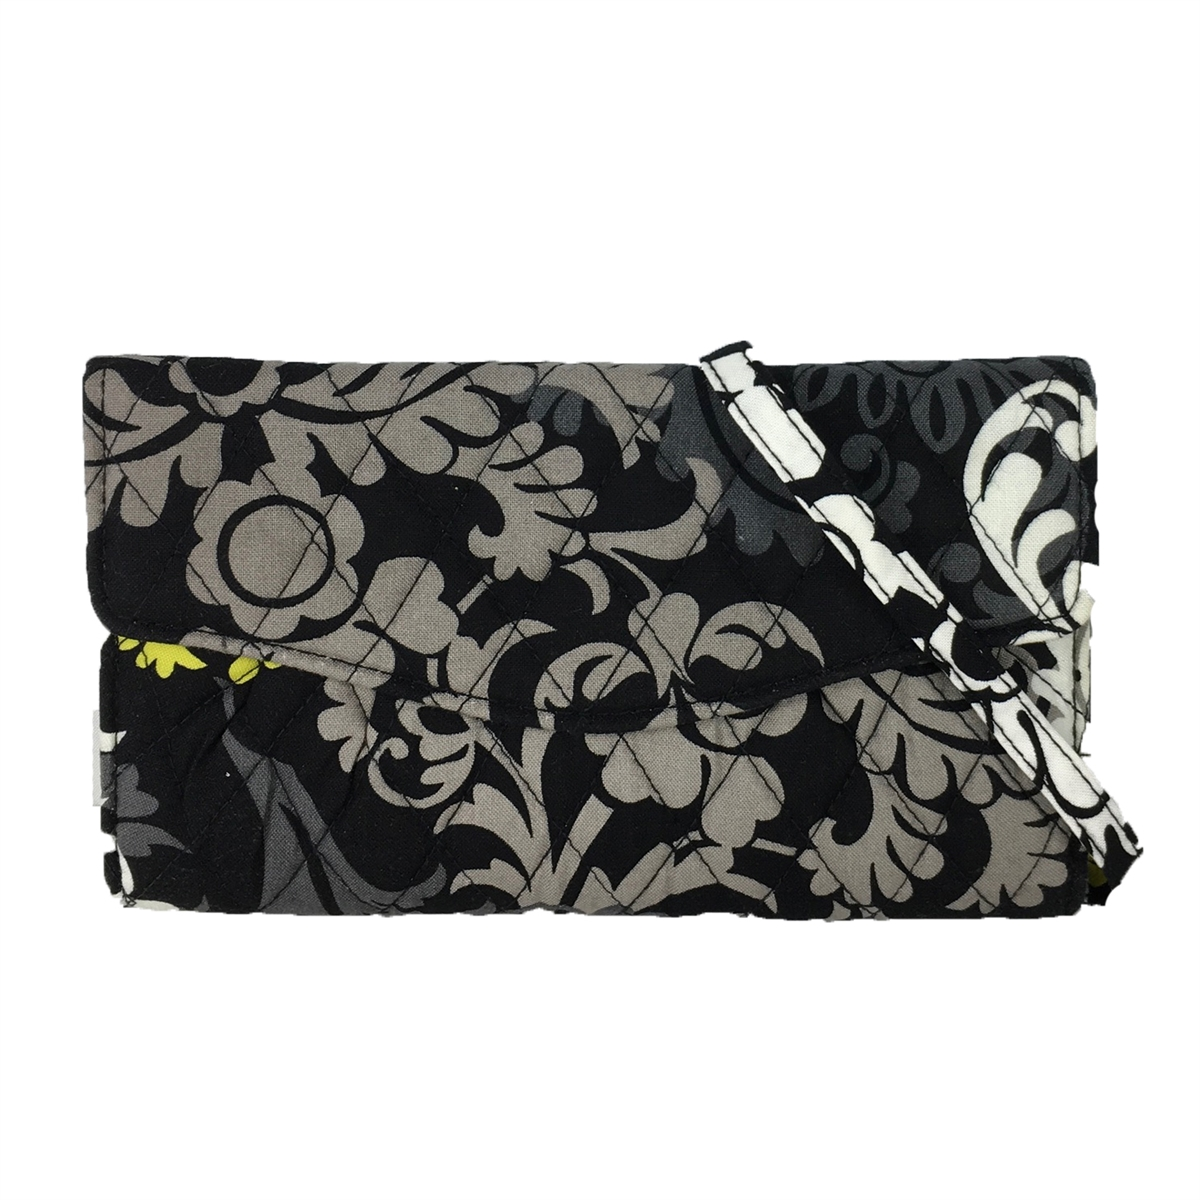 54574197b Vera Bradley Strap Wallet Crossbody Bag, Baroque